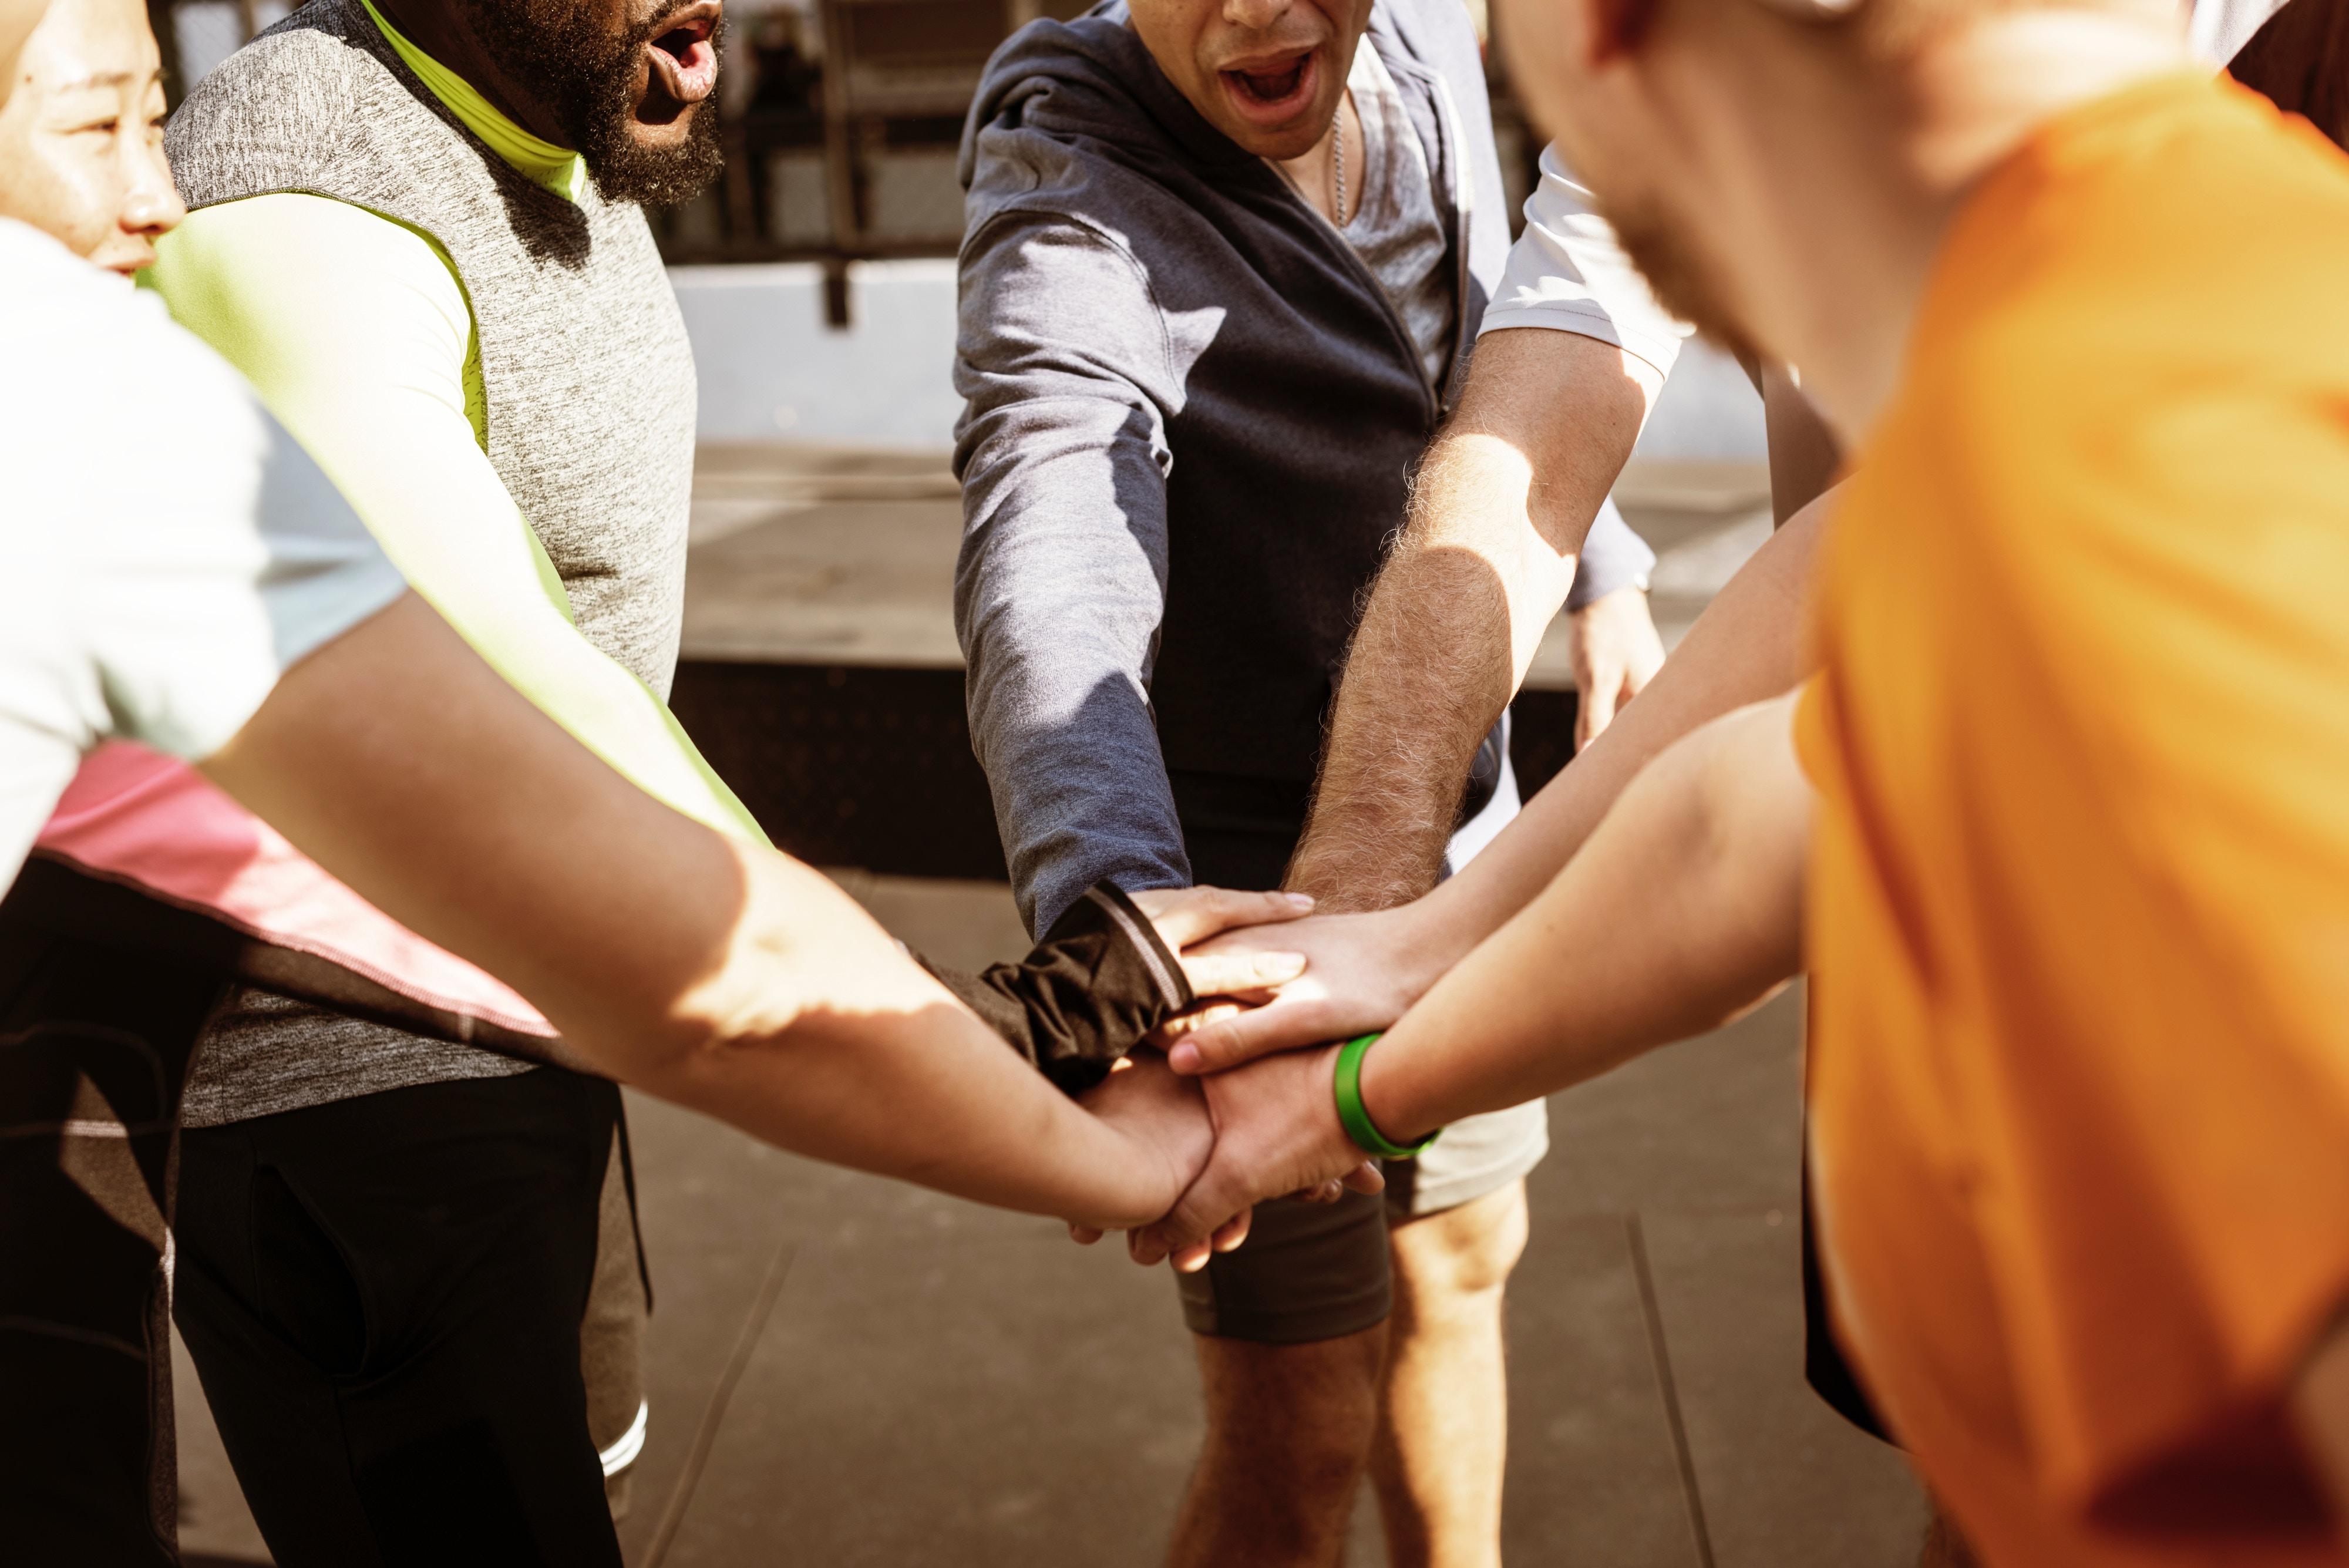 5 Ways to Encourage Those You Lead